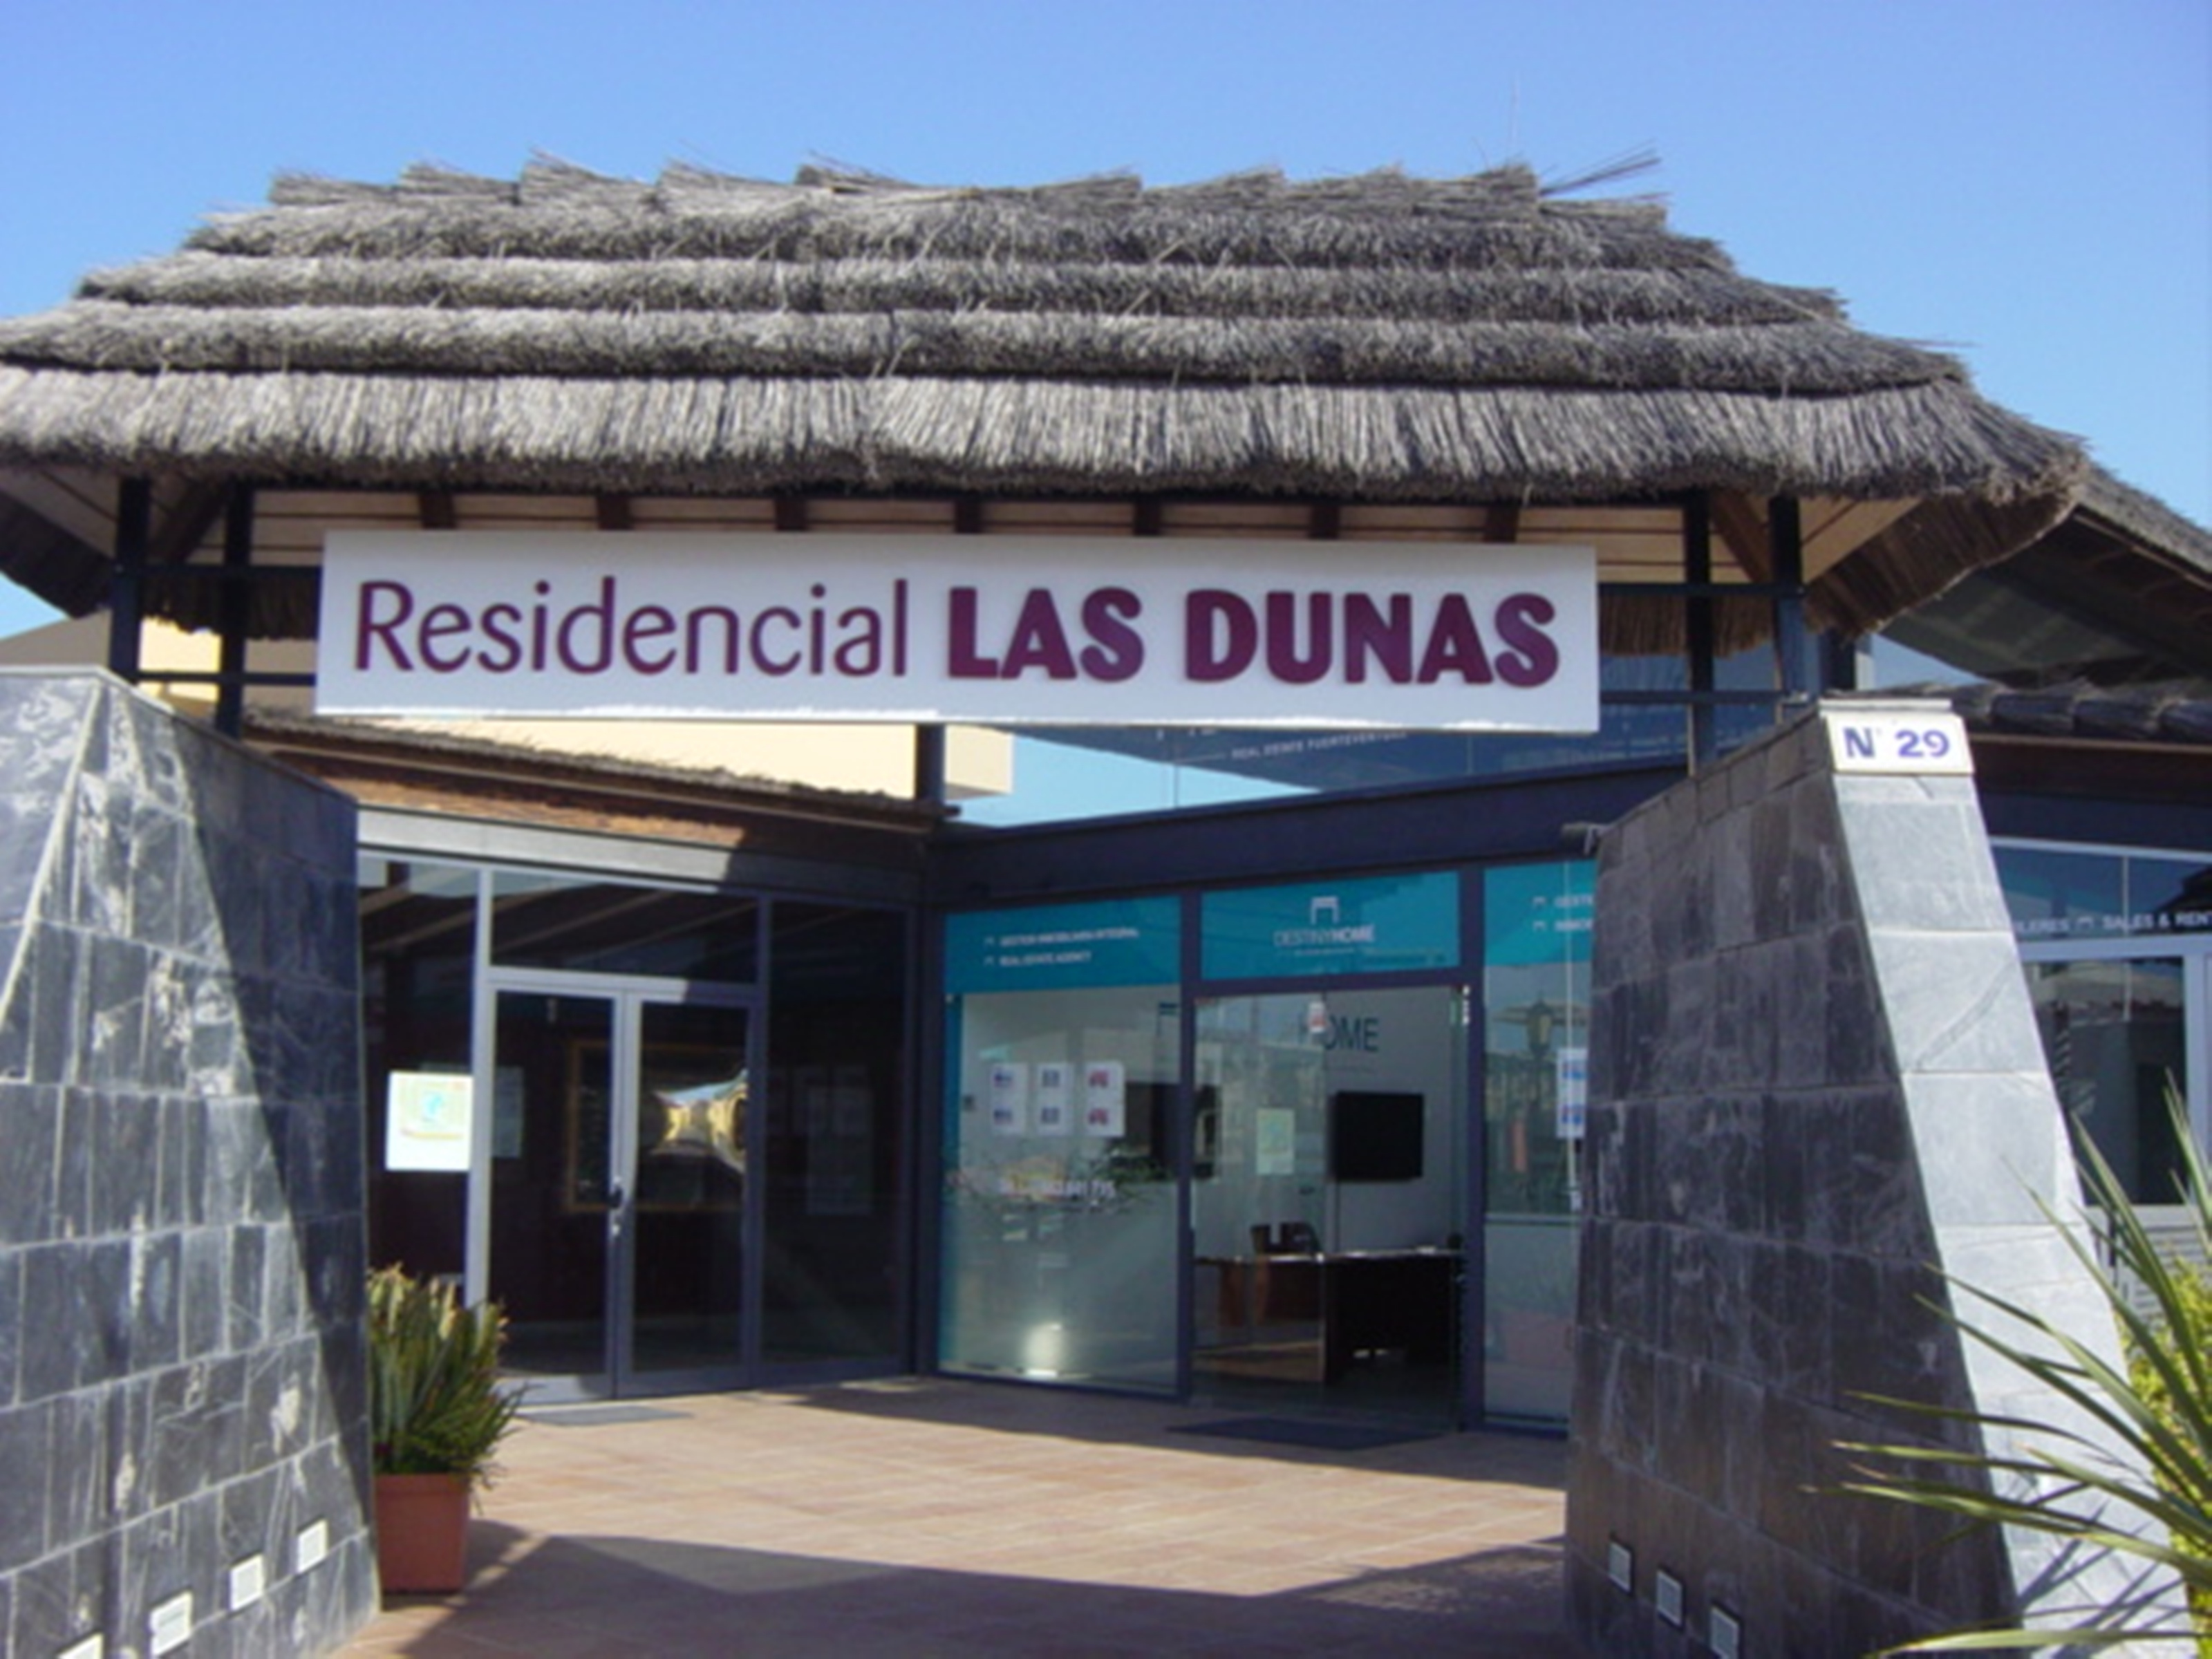 Ferienwohnung Wohnung El Mirador -Residencial Las Dunas - (2196686), Corralejo, Fuerteventura, Kanarische Inseln, Spanien, Bild 14